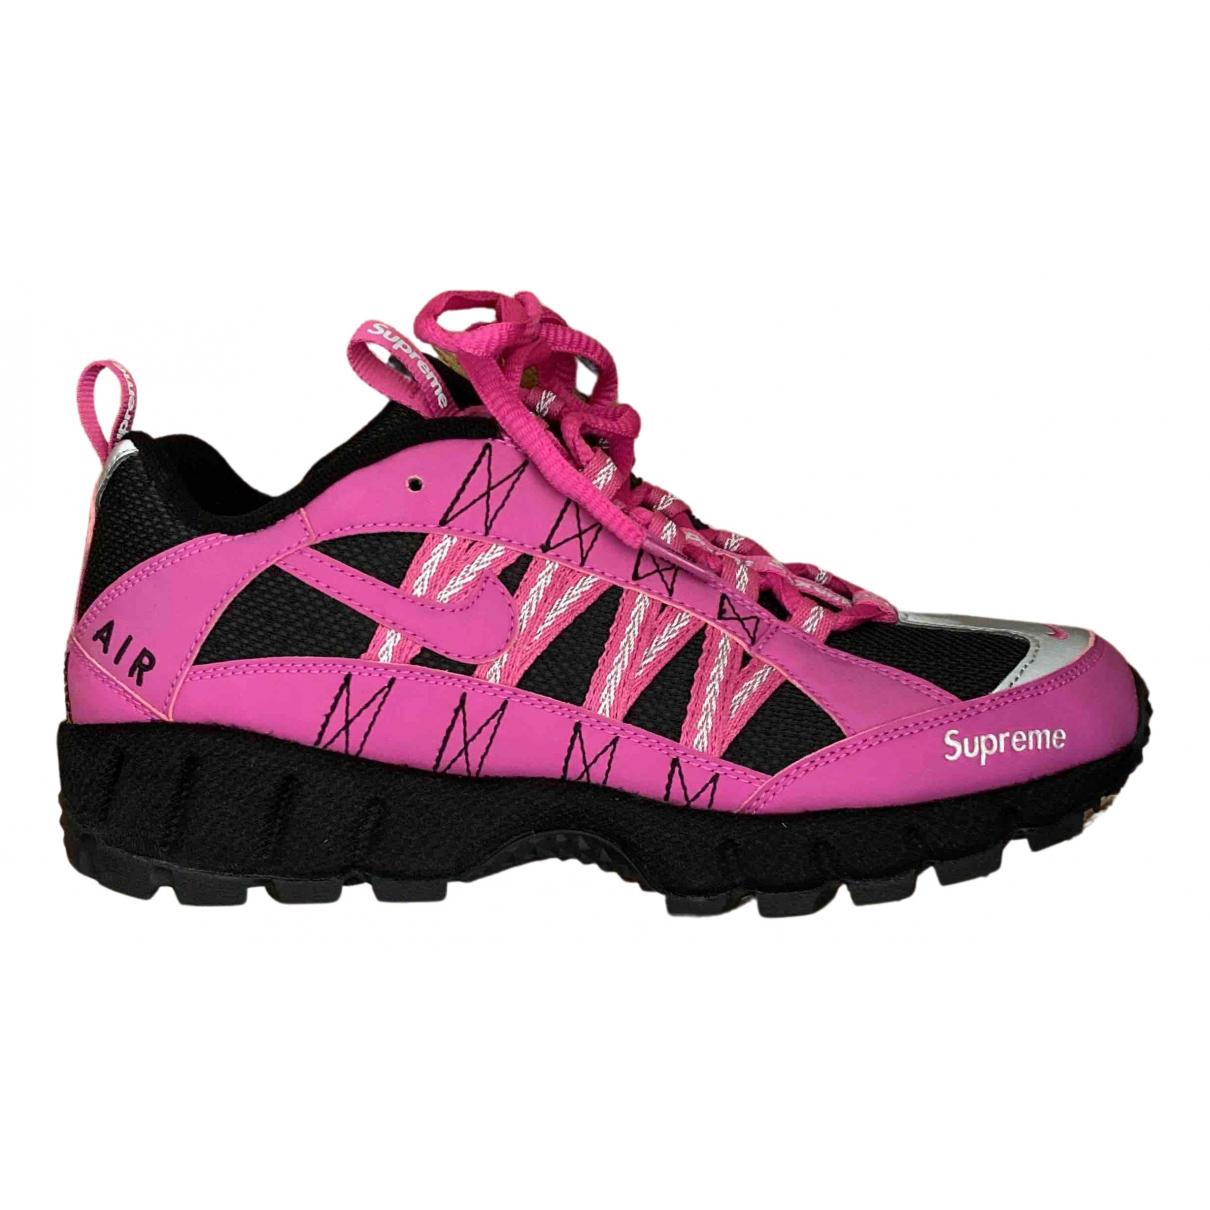 Nike X Supreme - Baskets   pour homme en toile - rose